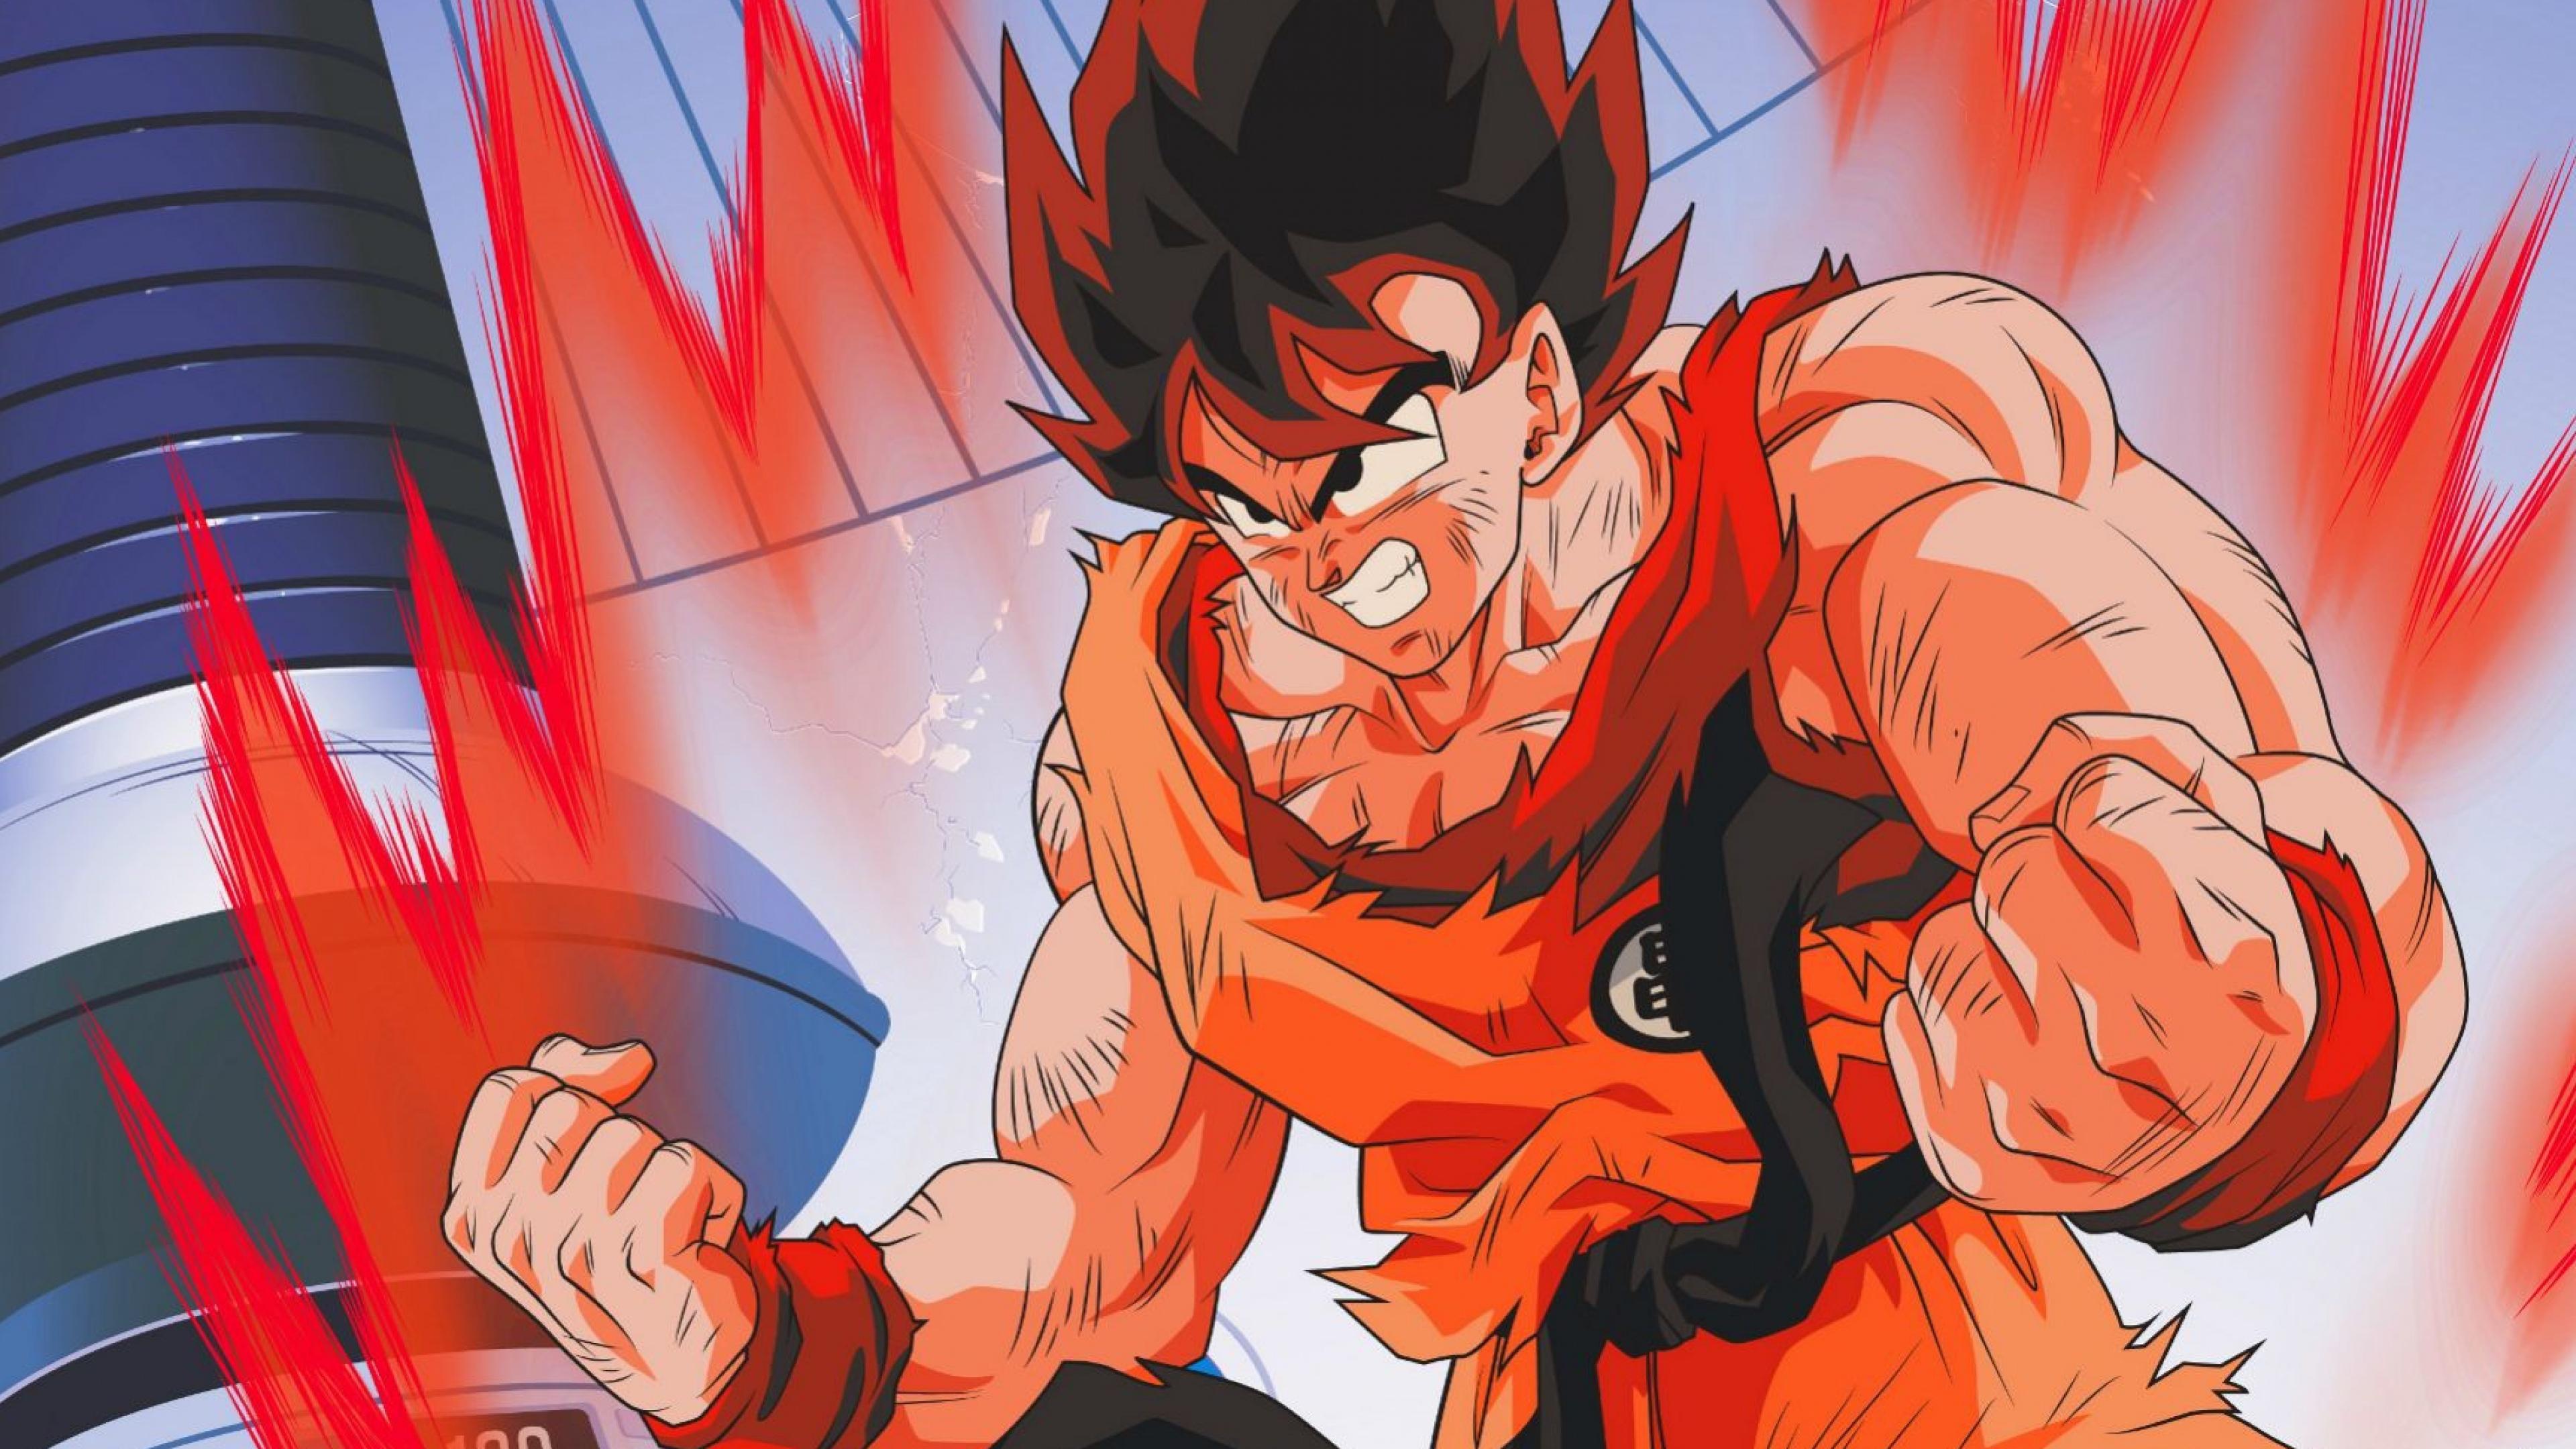 goku dragon ball z 4k 1541974145 - Goku Dragon Ball Z 4k - hd-wallpapers, goku wallpapers, dragon ball z wallpapers, dragon ball wallpapers, digital art wallpapers, deviantart wallpapers, artwork wallpapers, artist wallpapers, anime wallpapers, 4k-wallpapers